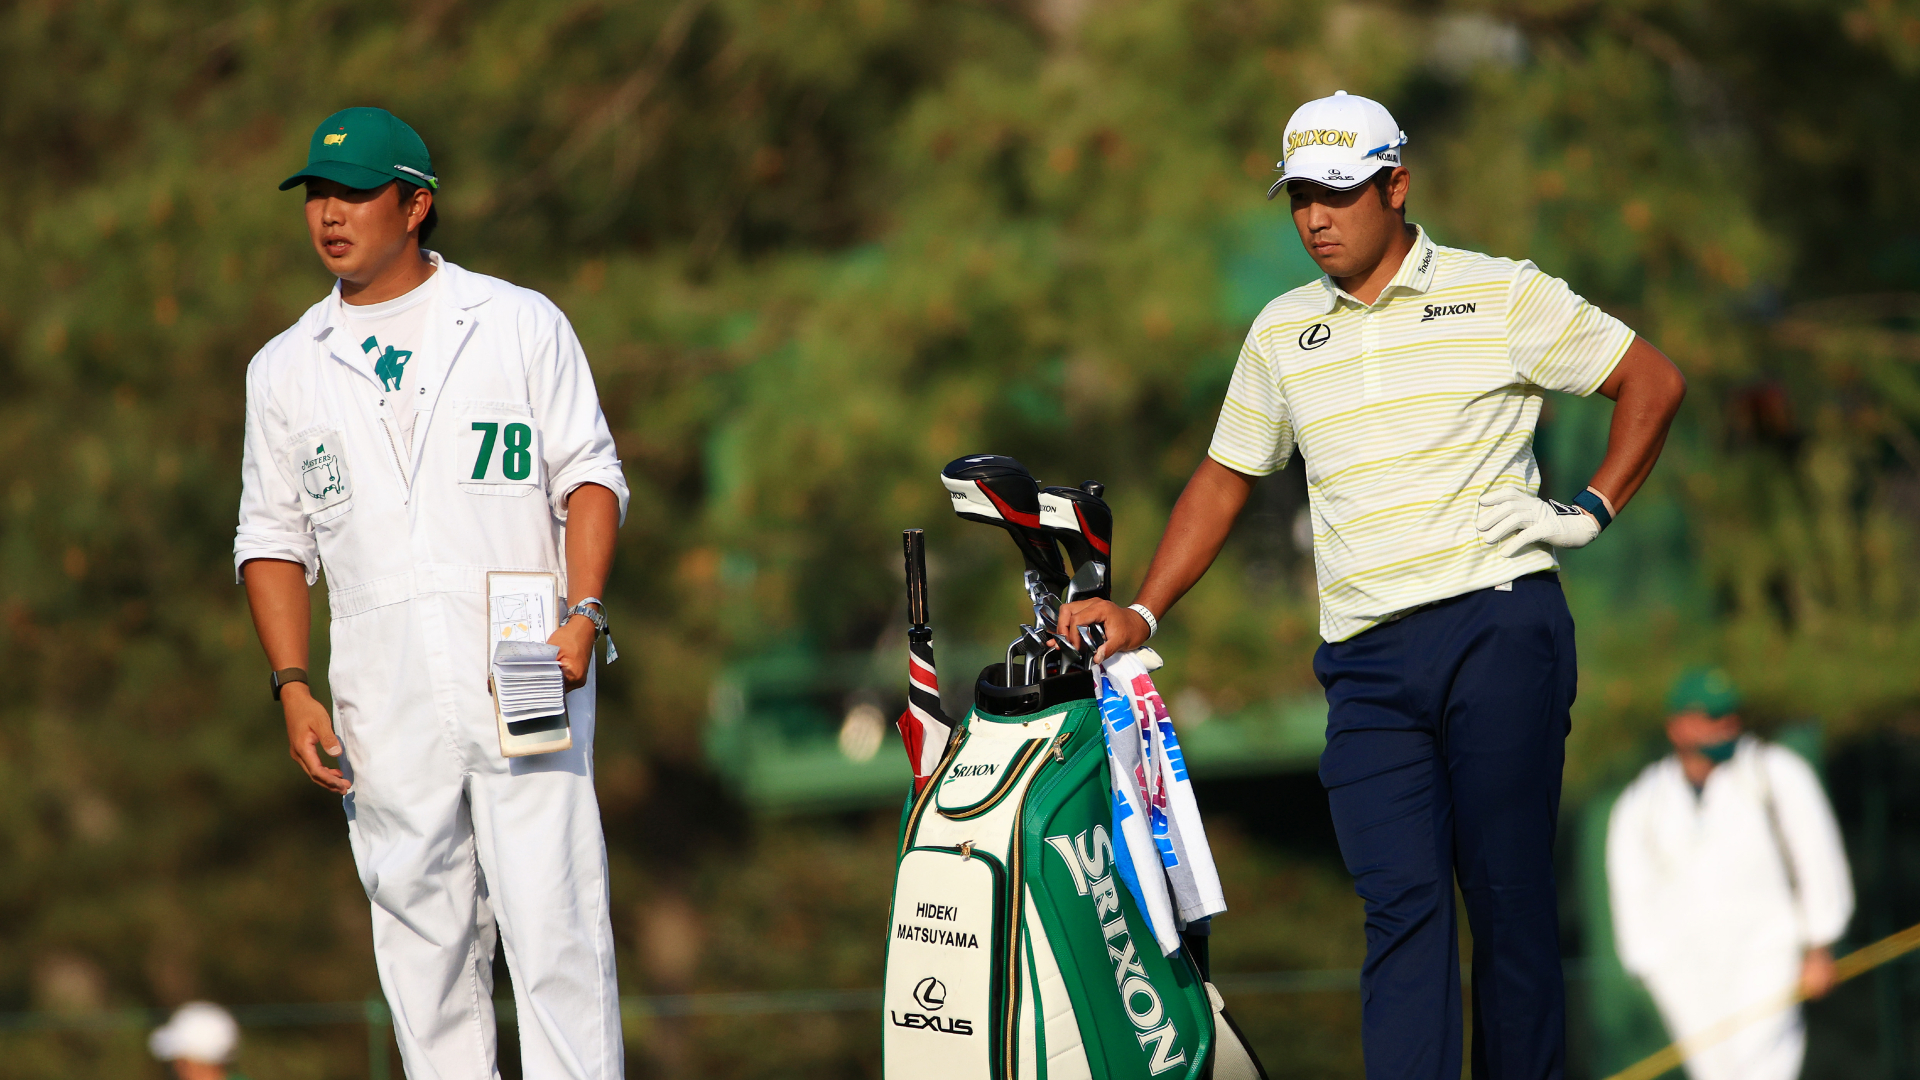 Hideki Matsuyama's caddie bows in respect to Augusta National following Masters win